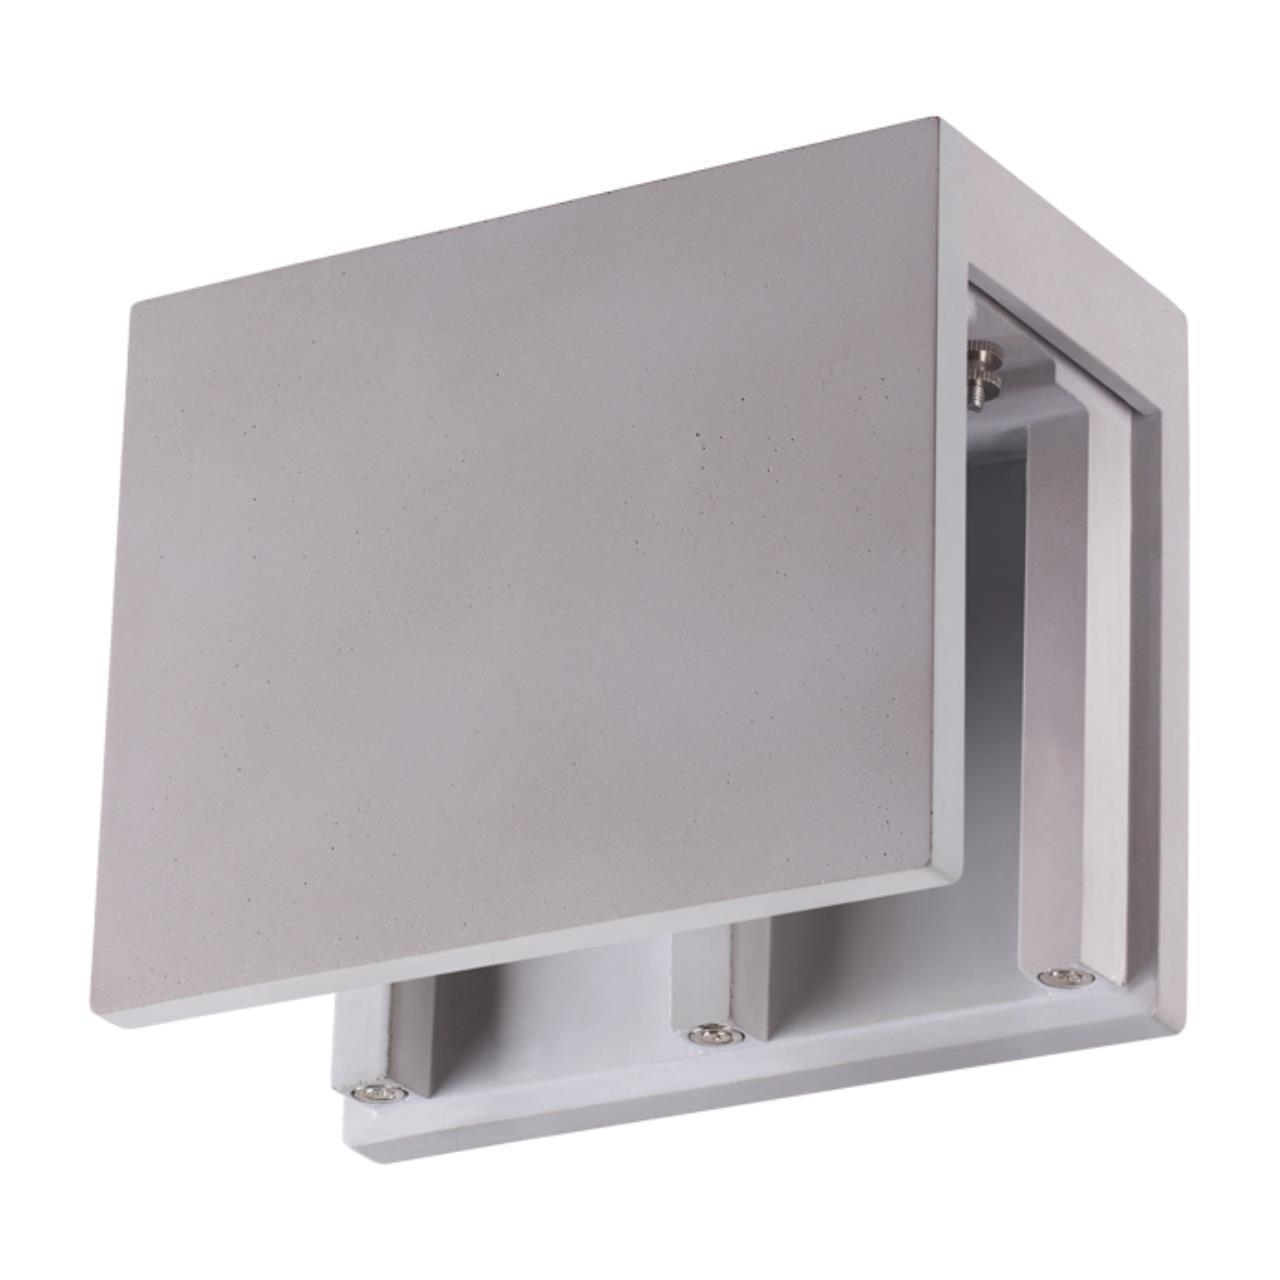 370505 KONST NT19 034 серый Накладной светильник IP20 GU10 2*50W 220-240V LEGIO